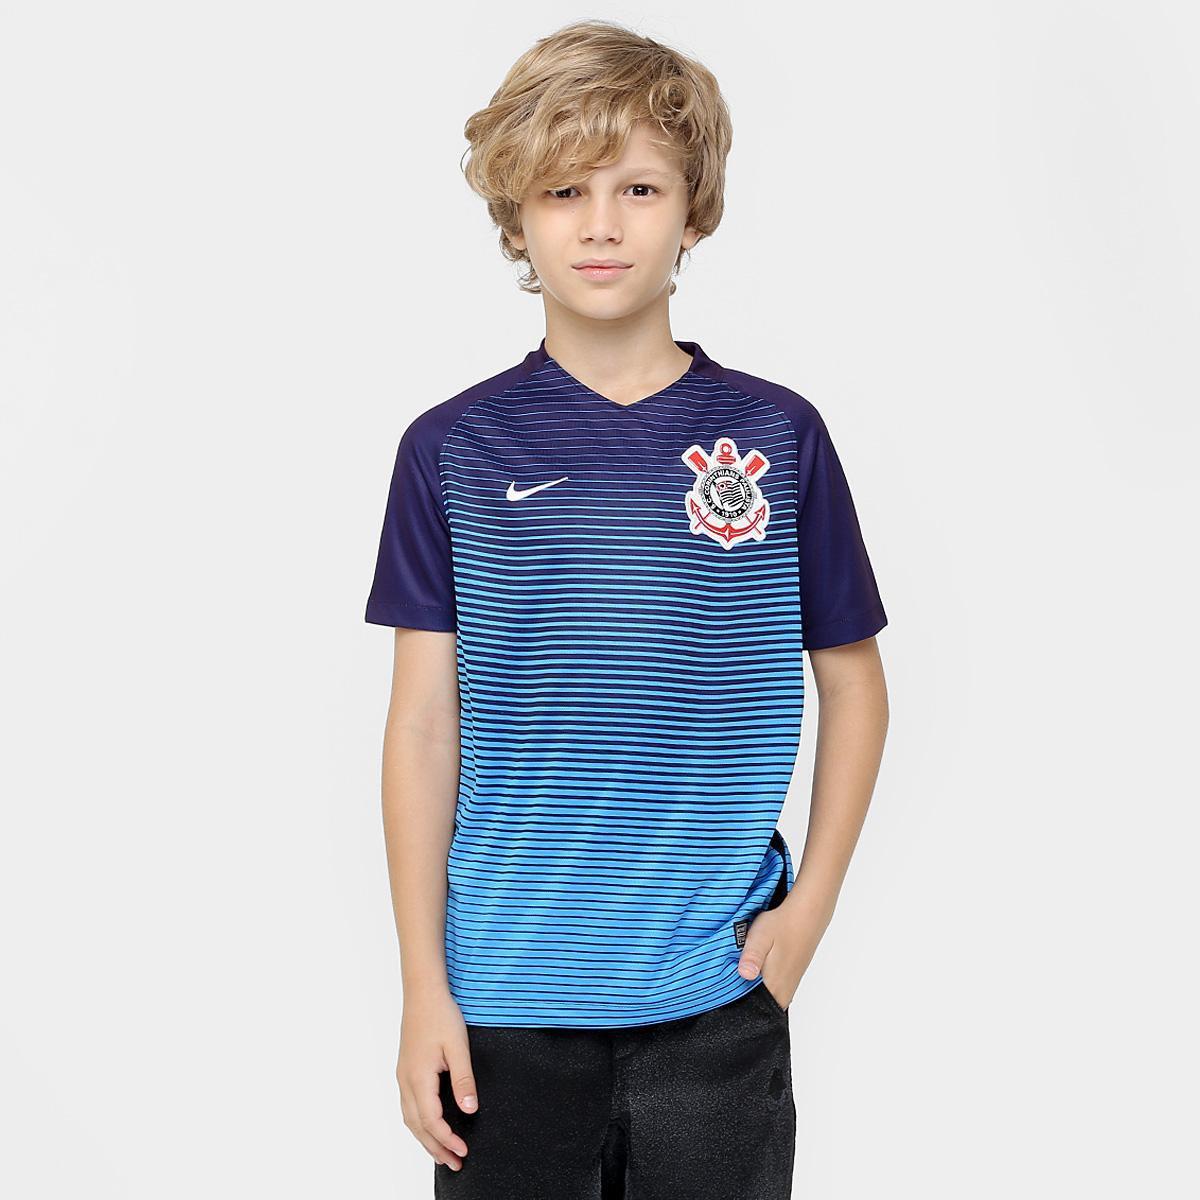 994363ddee Camisa Corinthians Juvenil III 2016 s nº Torcedor Nike - Compre Agora